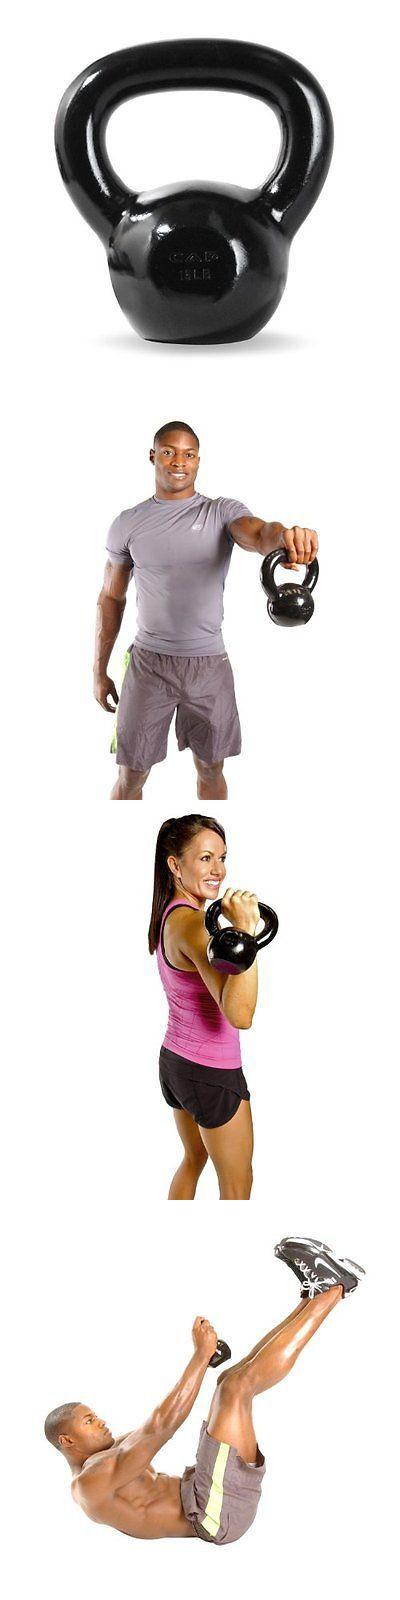 Kettlebells 179814: Cap Barbell Kettlebell 40 Lb Pounds Workout Muscle Balance Training Fitness Gear -> BUY IT NOW ONLY: $47.14 on eBay!  https://www.kettlebellmaniac.com/shop/